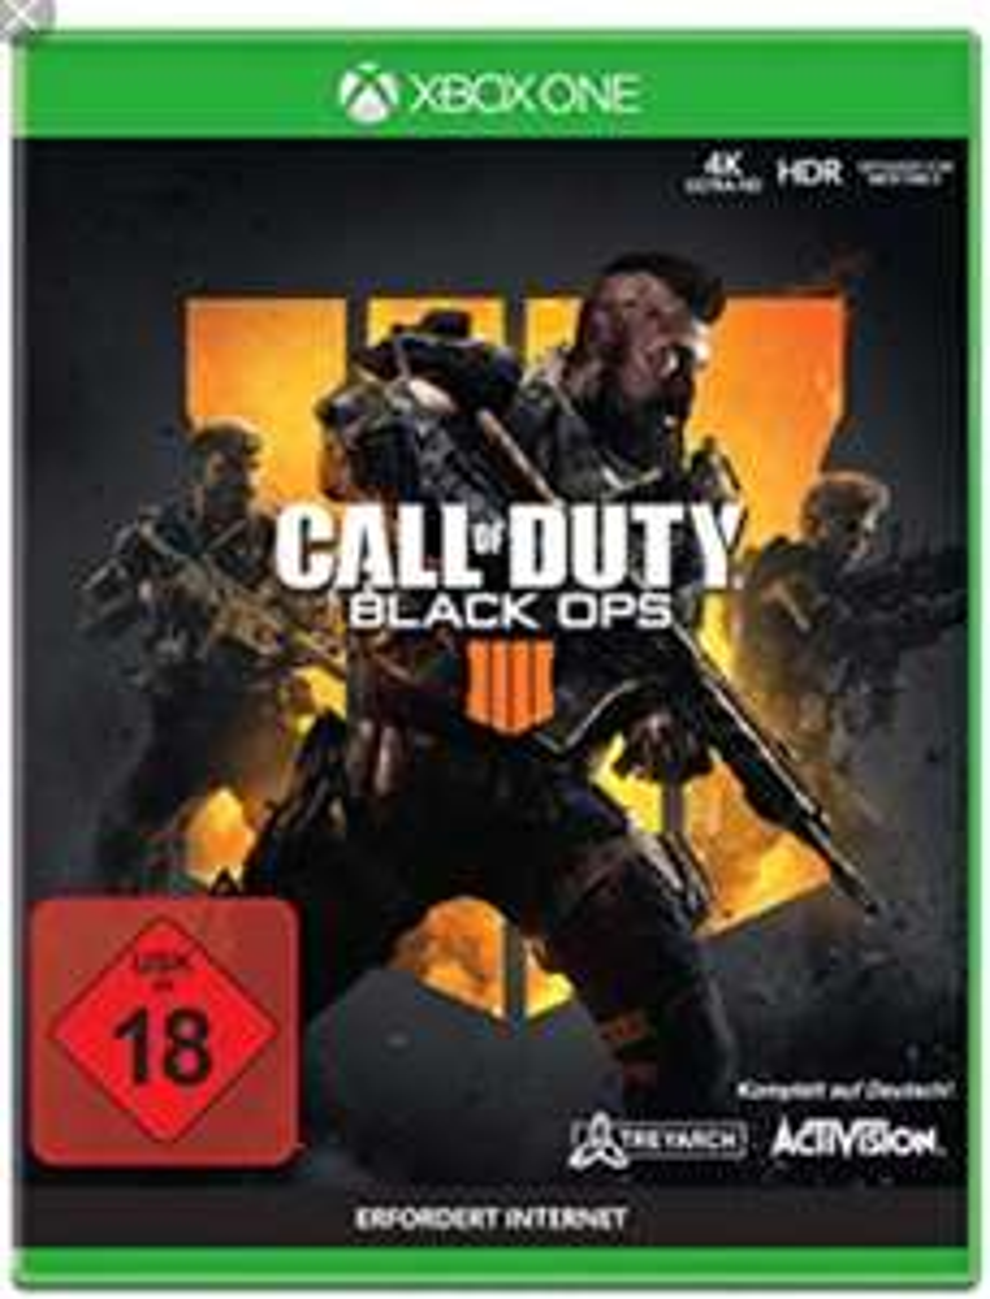 Call of Duty: Black Ops 4 (Xbox One) Amazon.de für 16,97€ bzw. für 16,63€ bei Amazon.fr